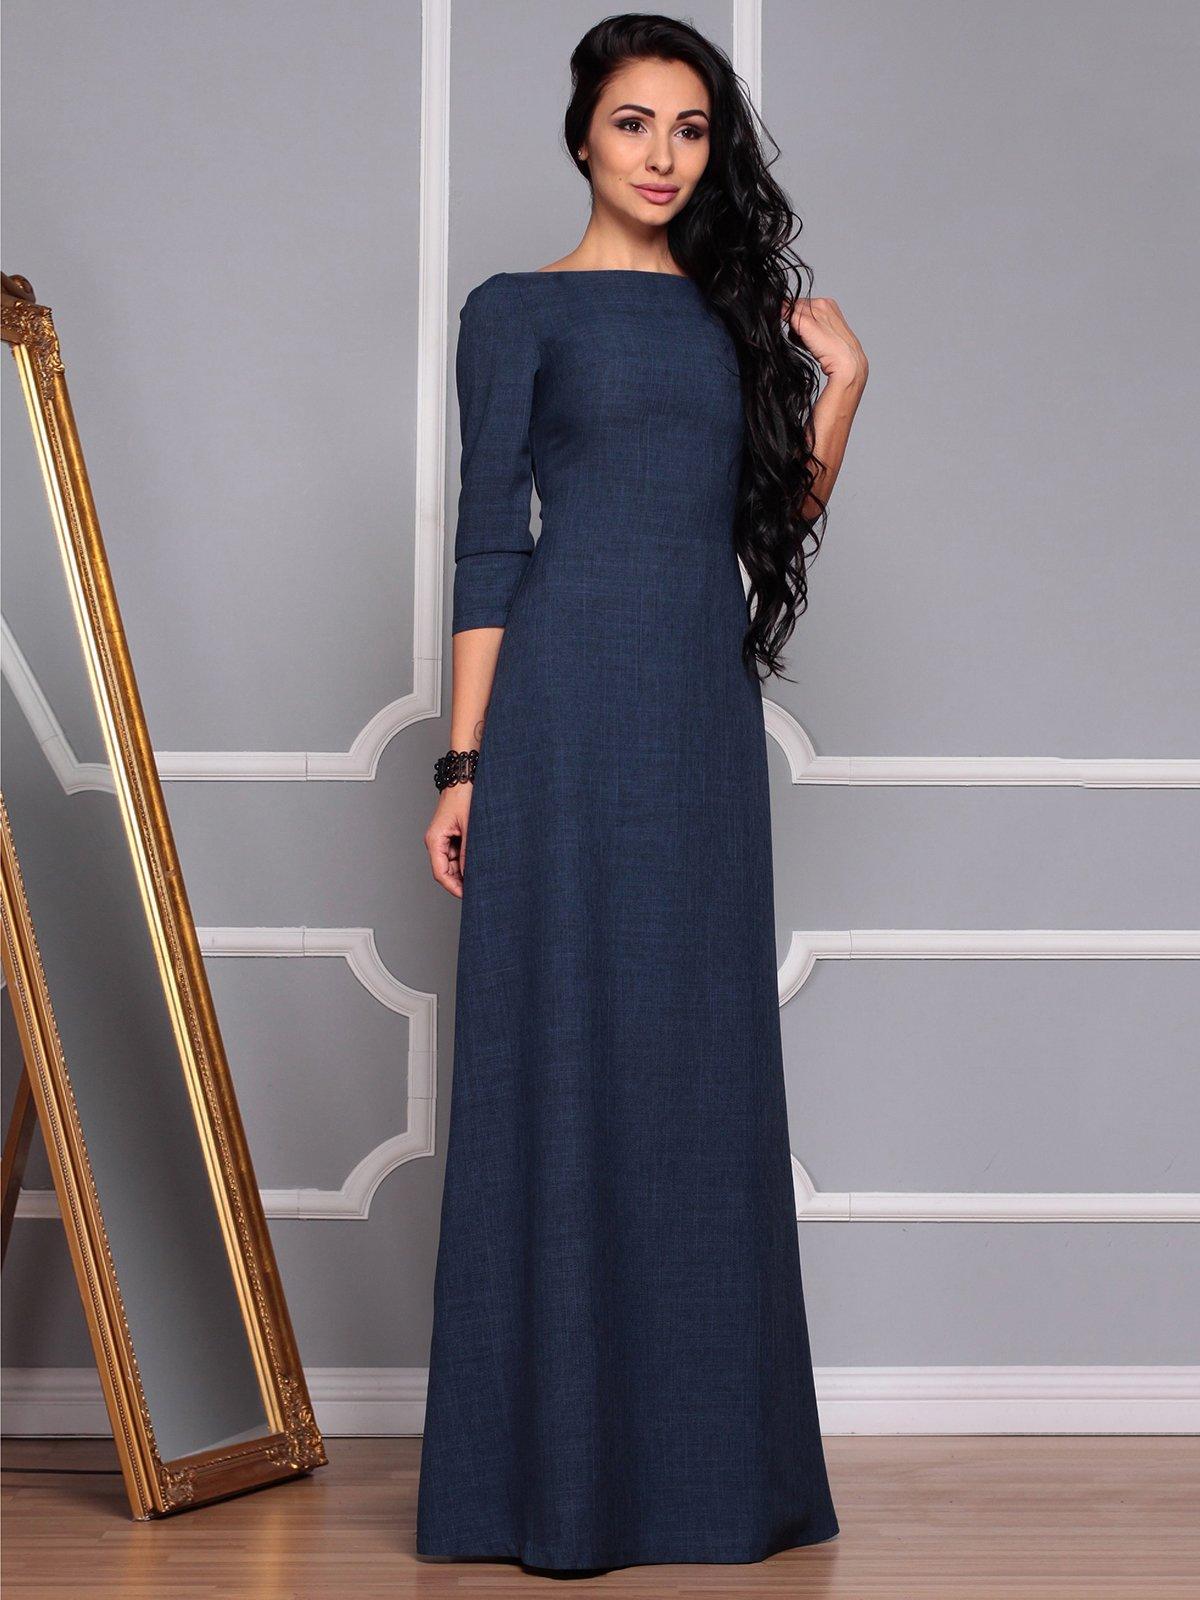 Платье темно-синее | 3719869 | фото 4